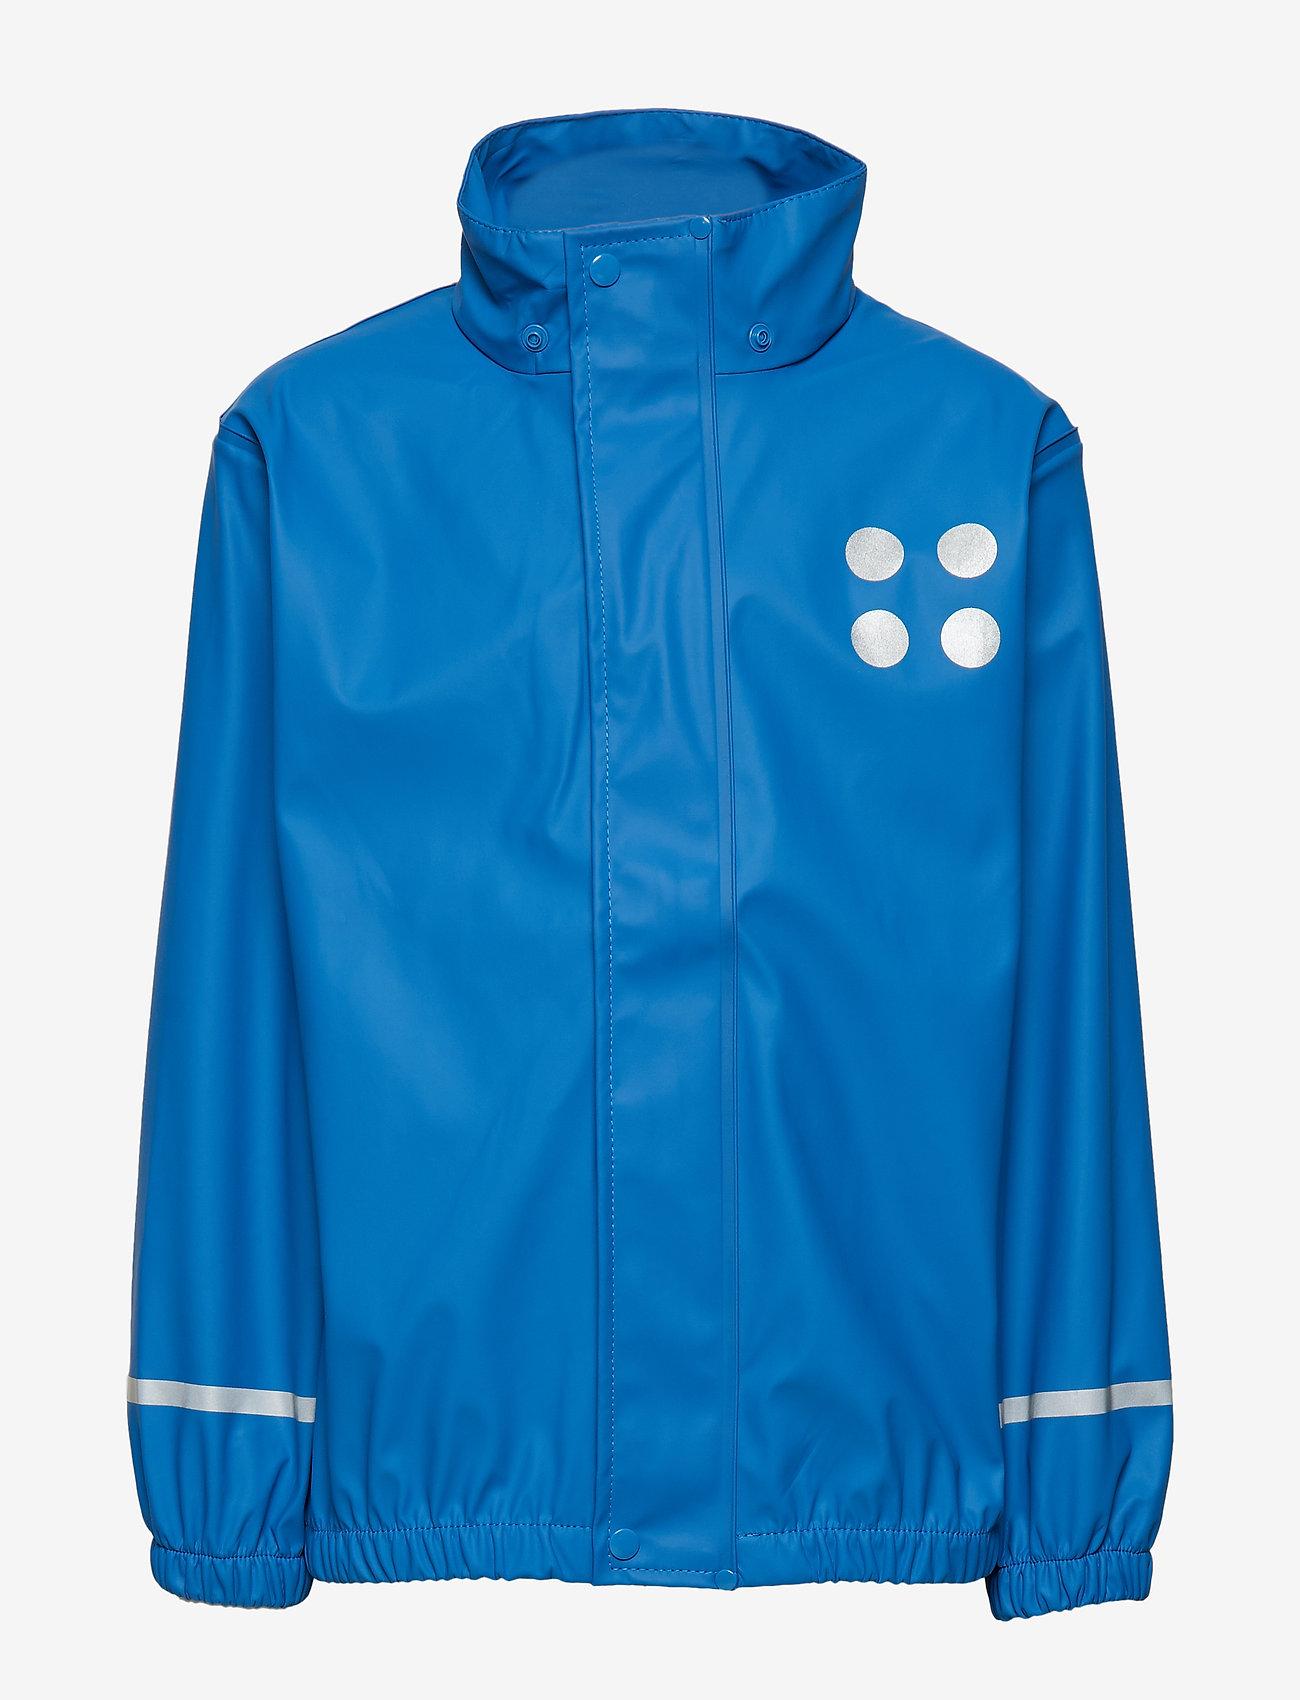 Lego wear - JONATHAN 101 - RAIN JACKET - vestes - blue - 1